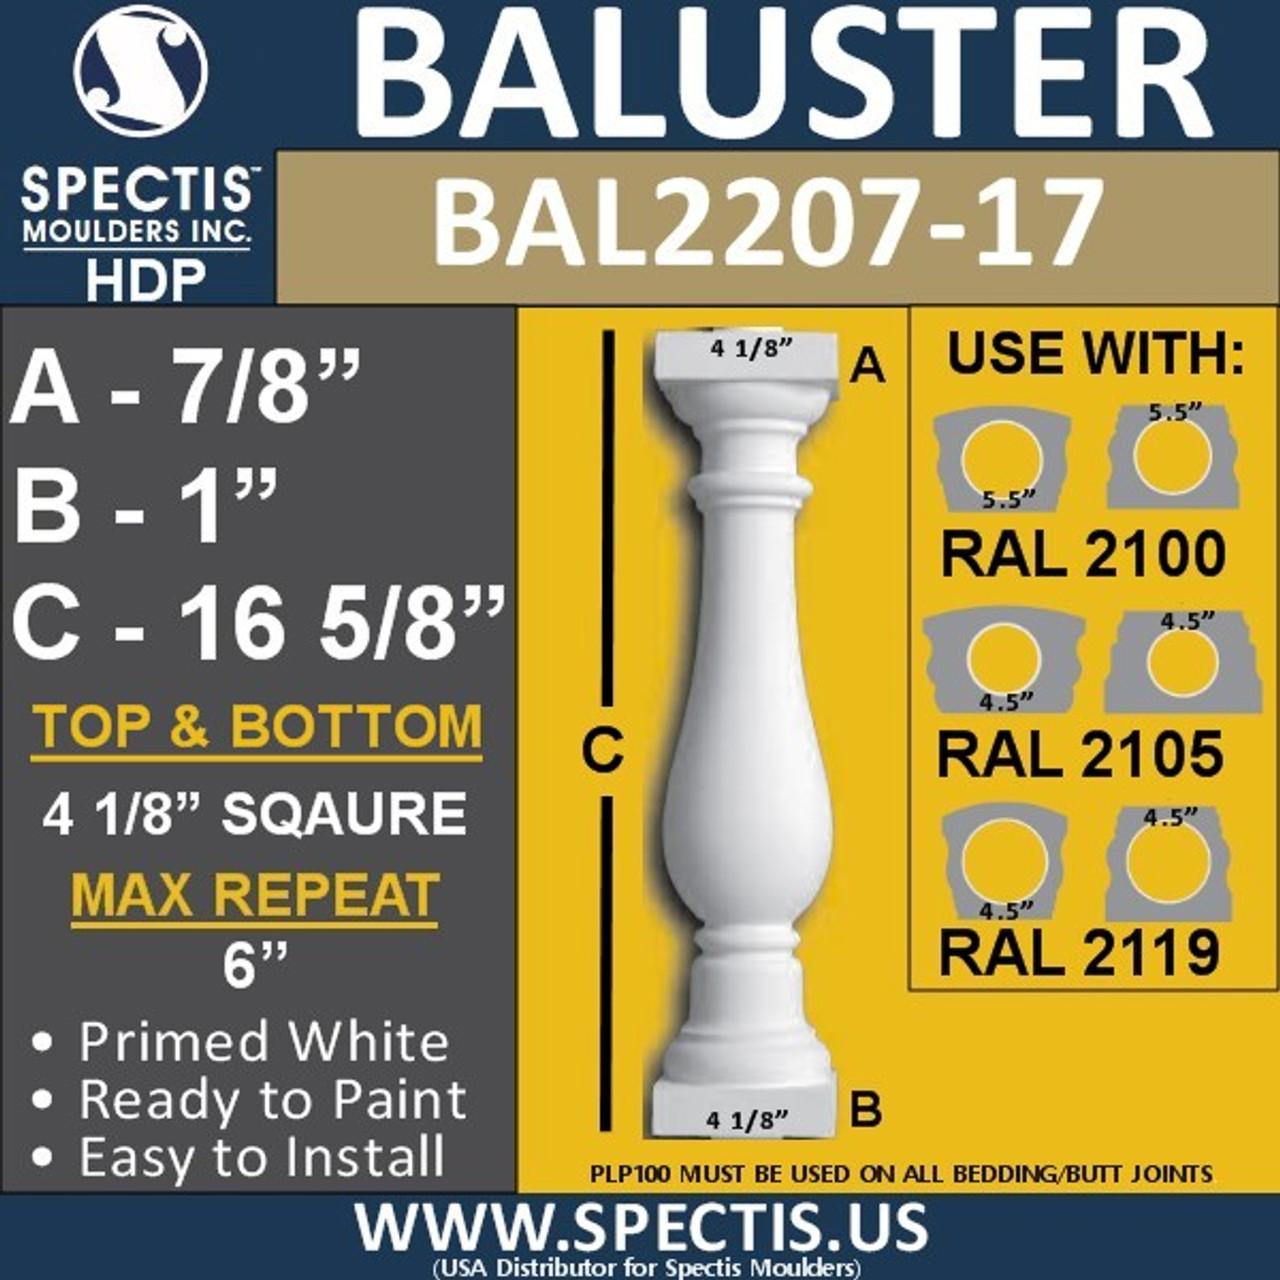 "BAL2207-17 Spectis Urethane Railing Baluster 4 1/8"" x 16 5/8"""